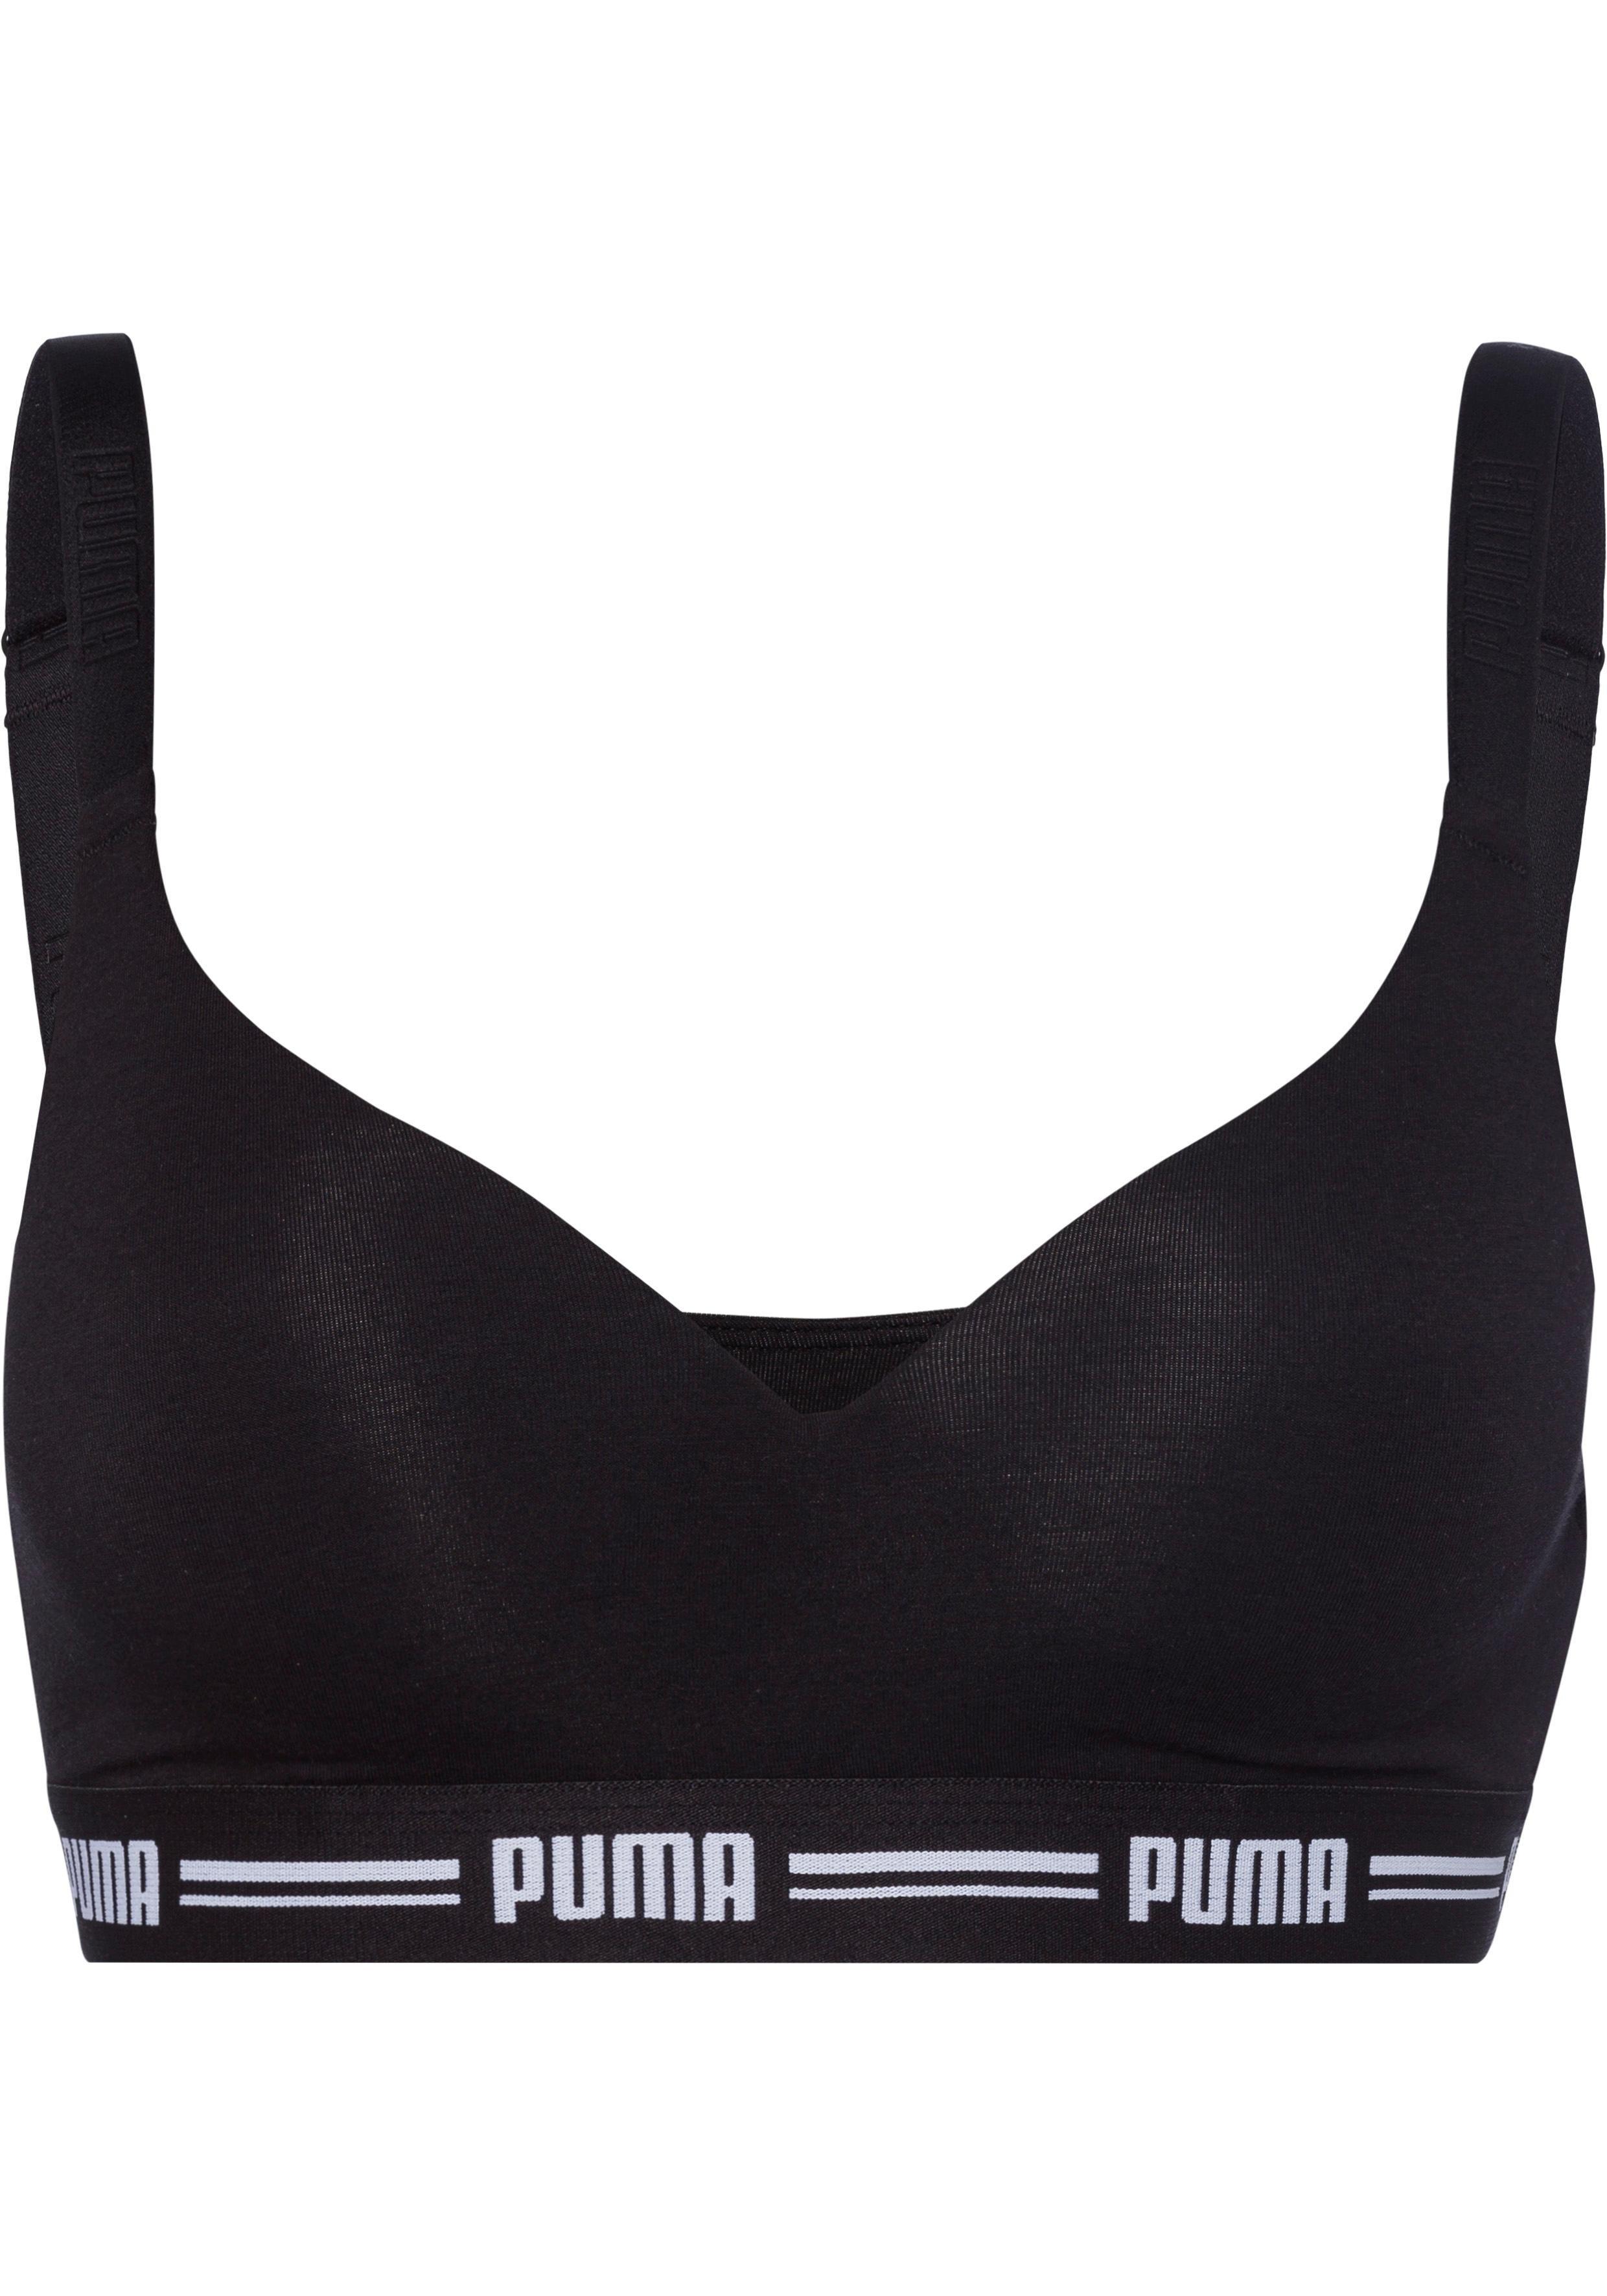 Puma Iconic bralette-bh bij Lascana online kopen